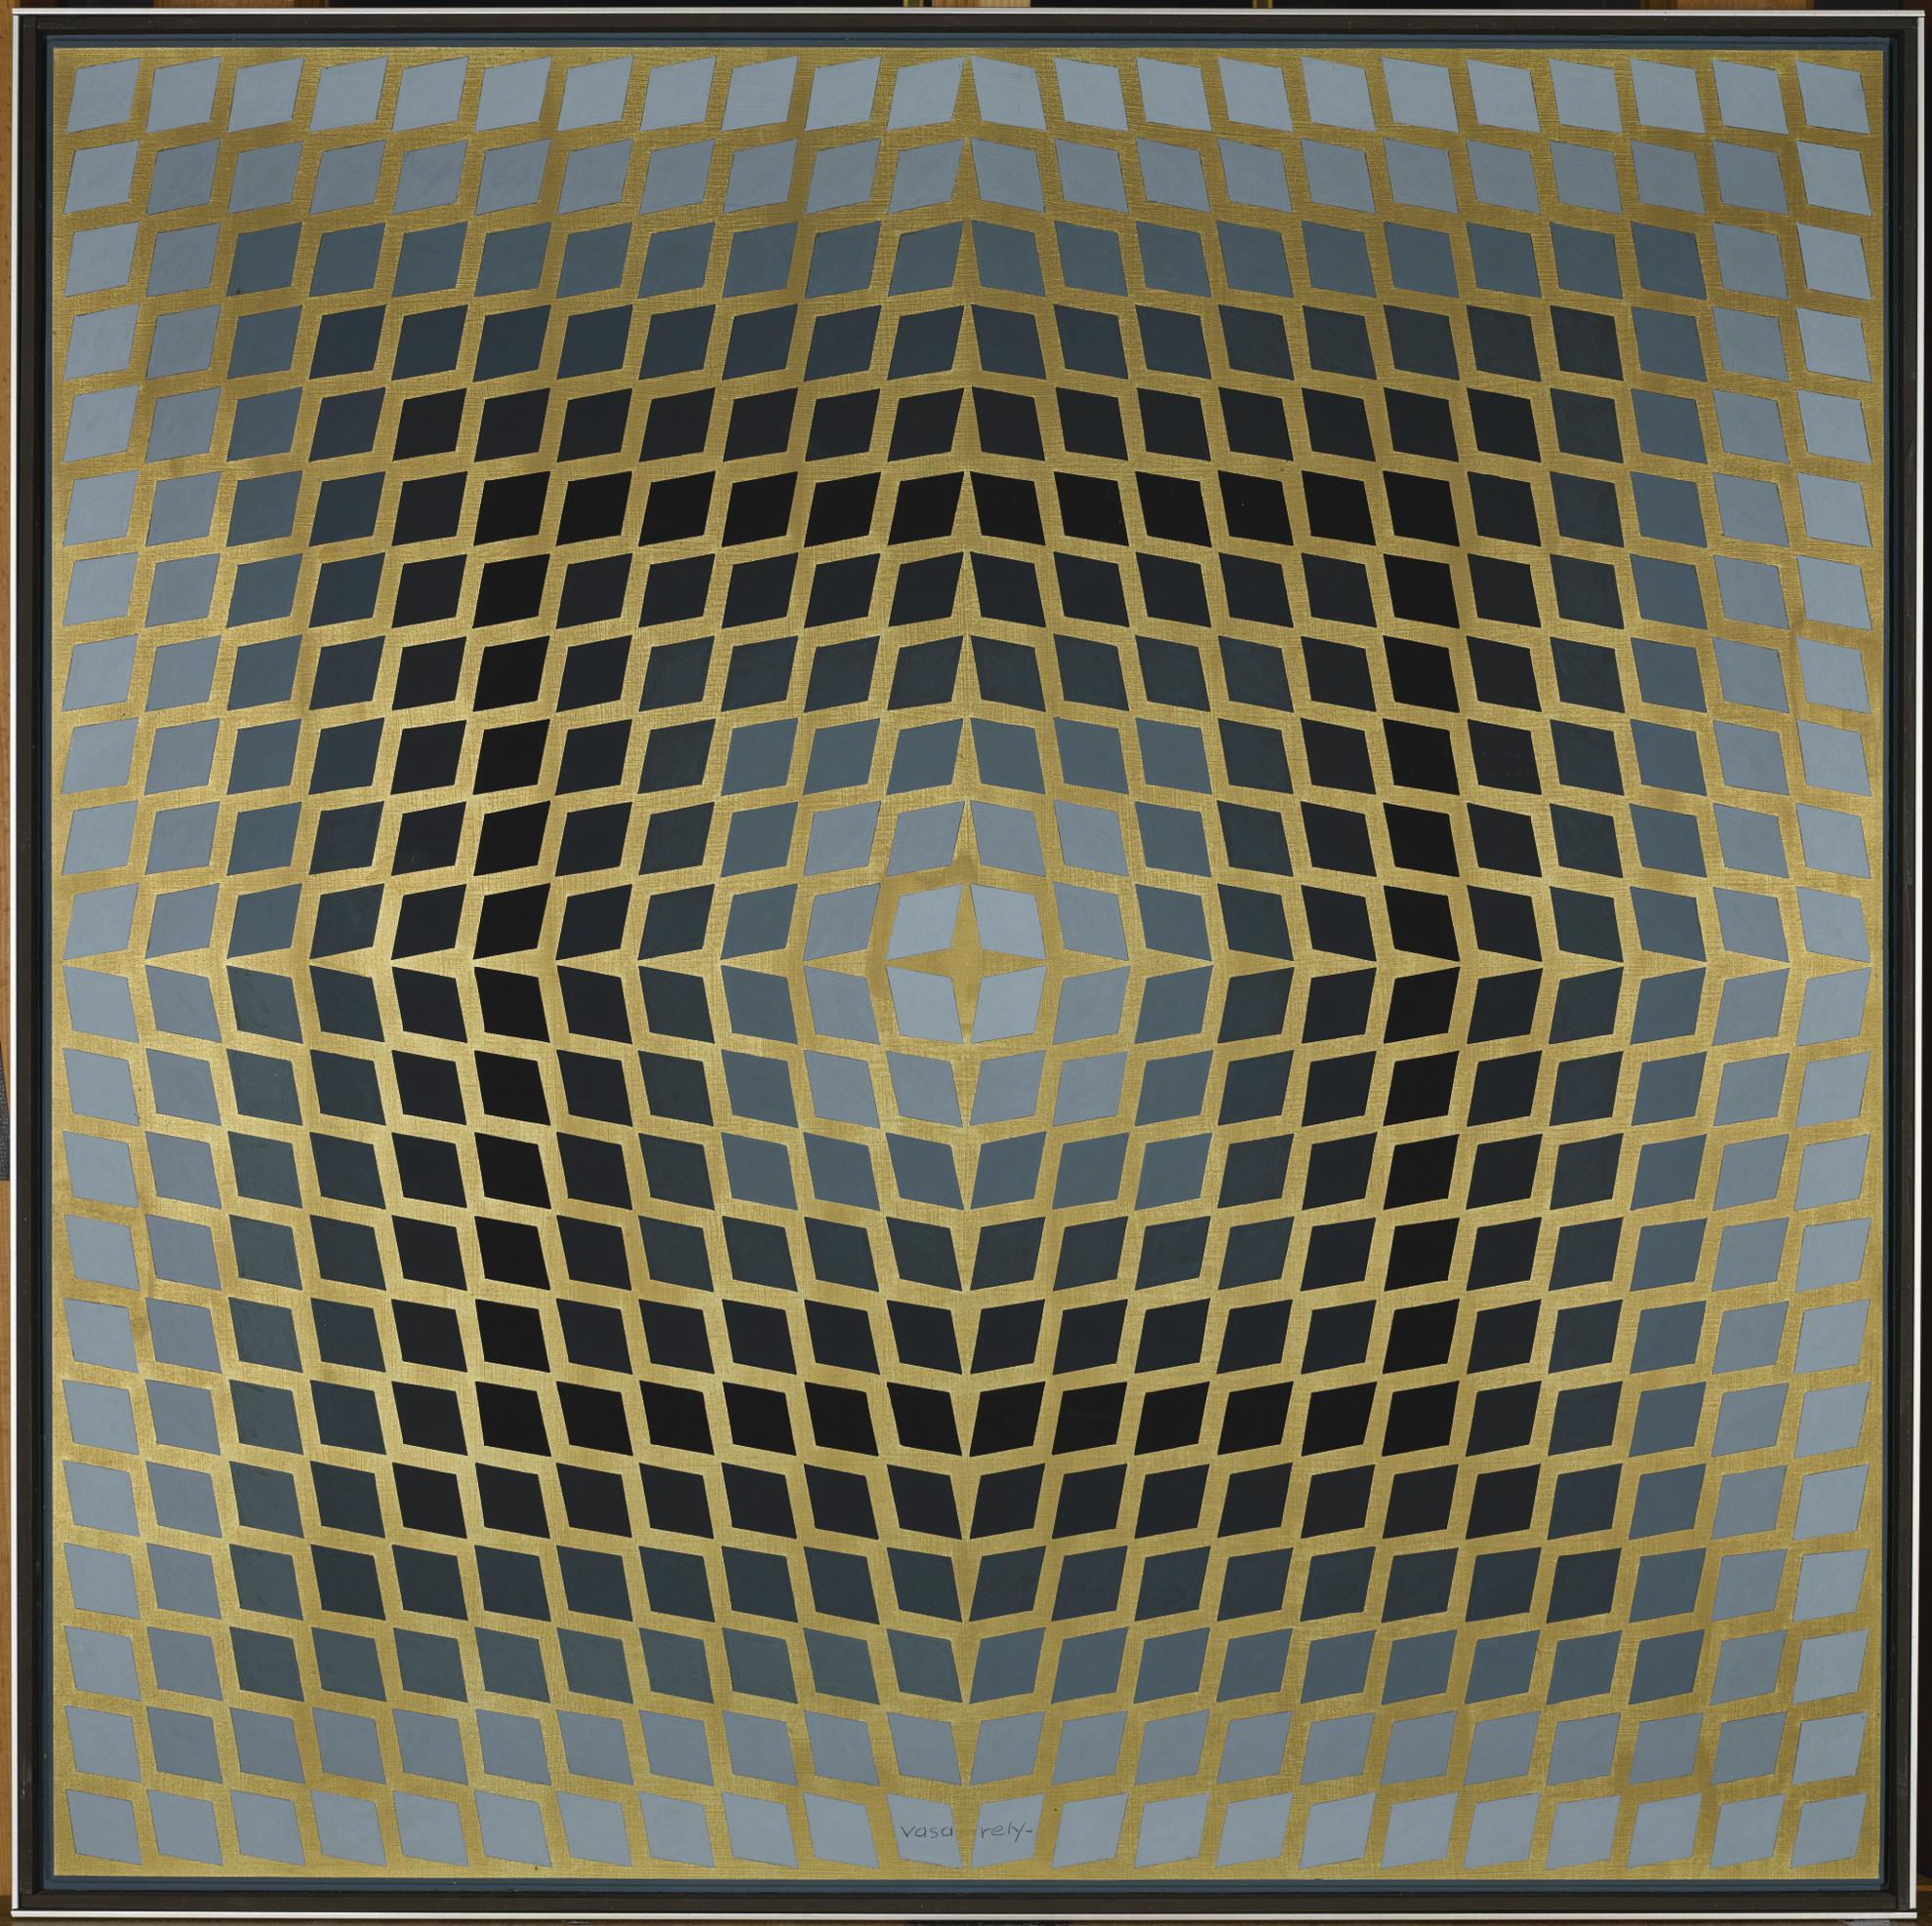 Victor Vasarely-Pulsar - Va-1970